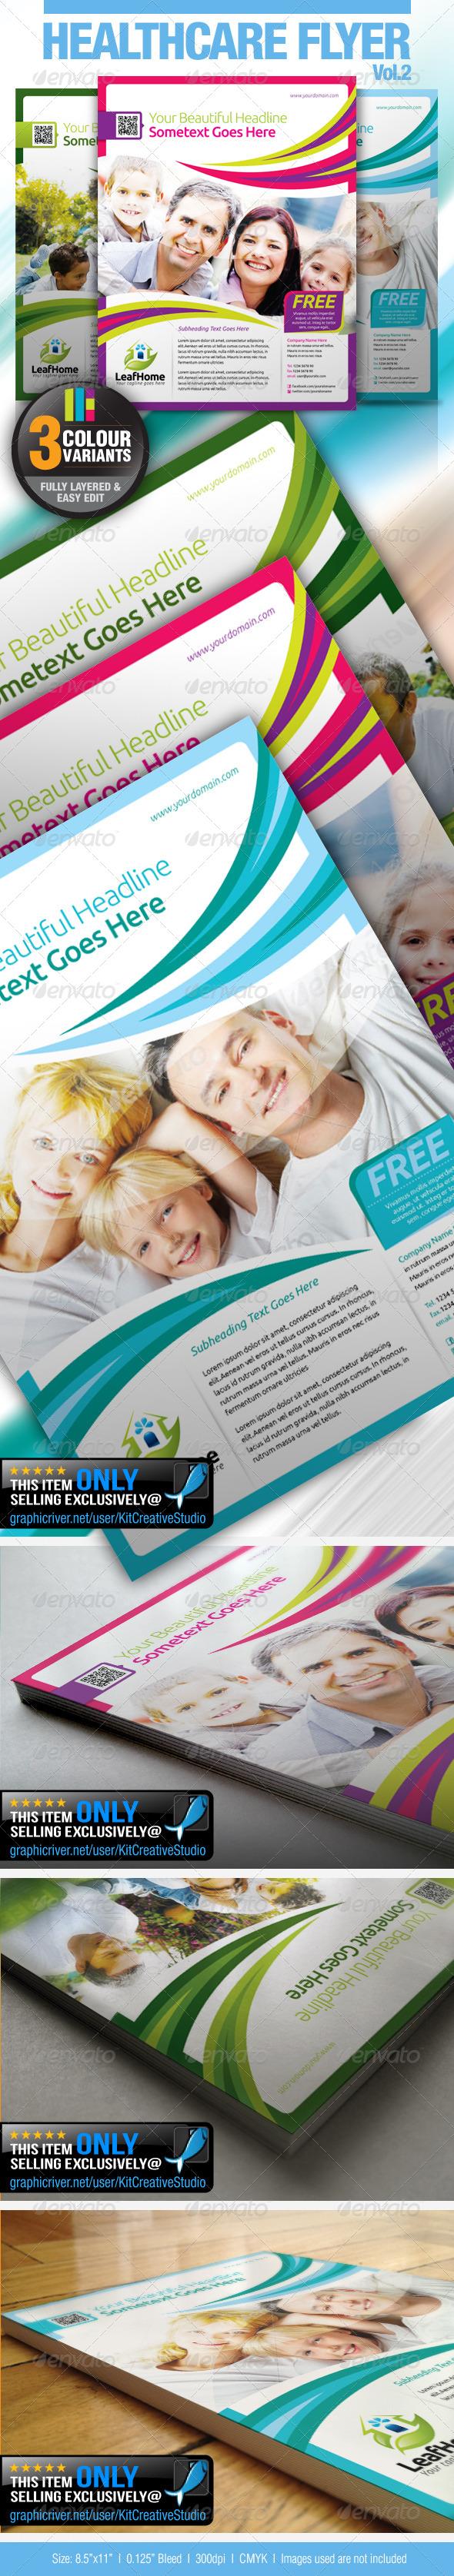 Healthcare Flyer Vol.2 - Corporate Flyers